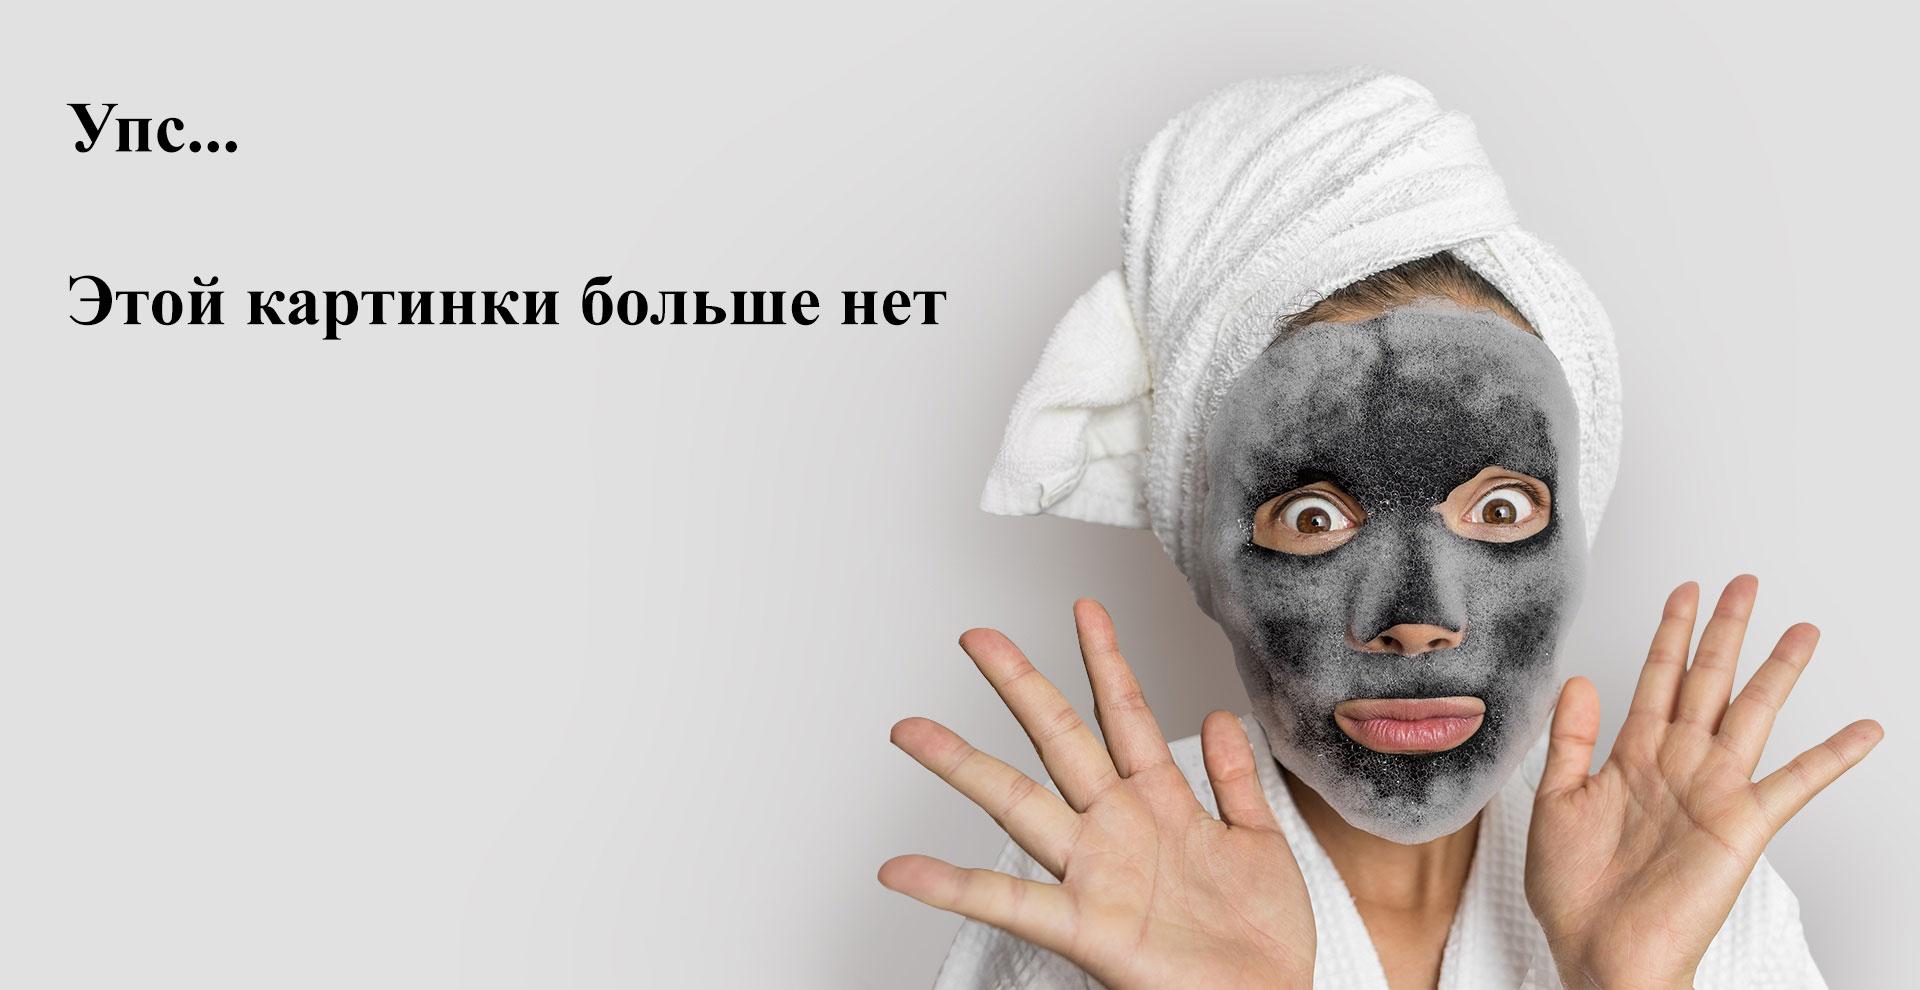 Patrisa Nail, Гель-лак Московская сага №746